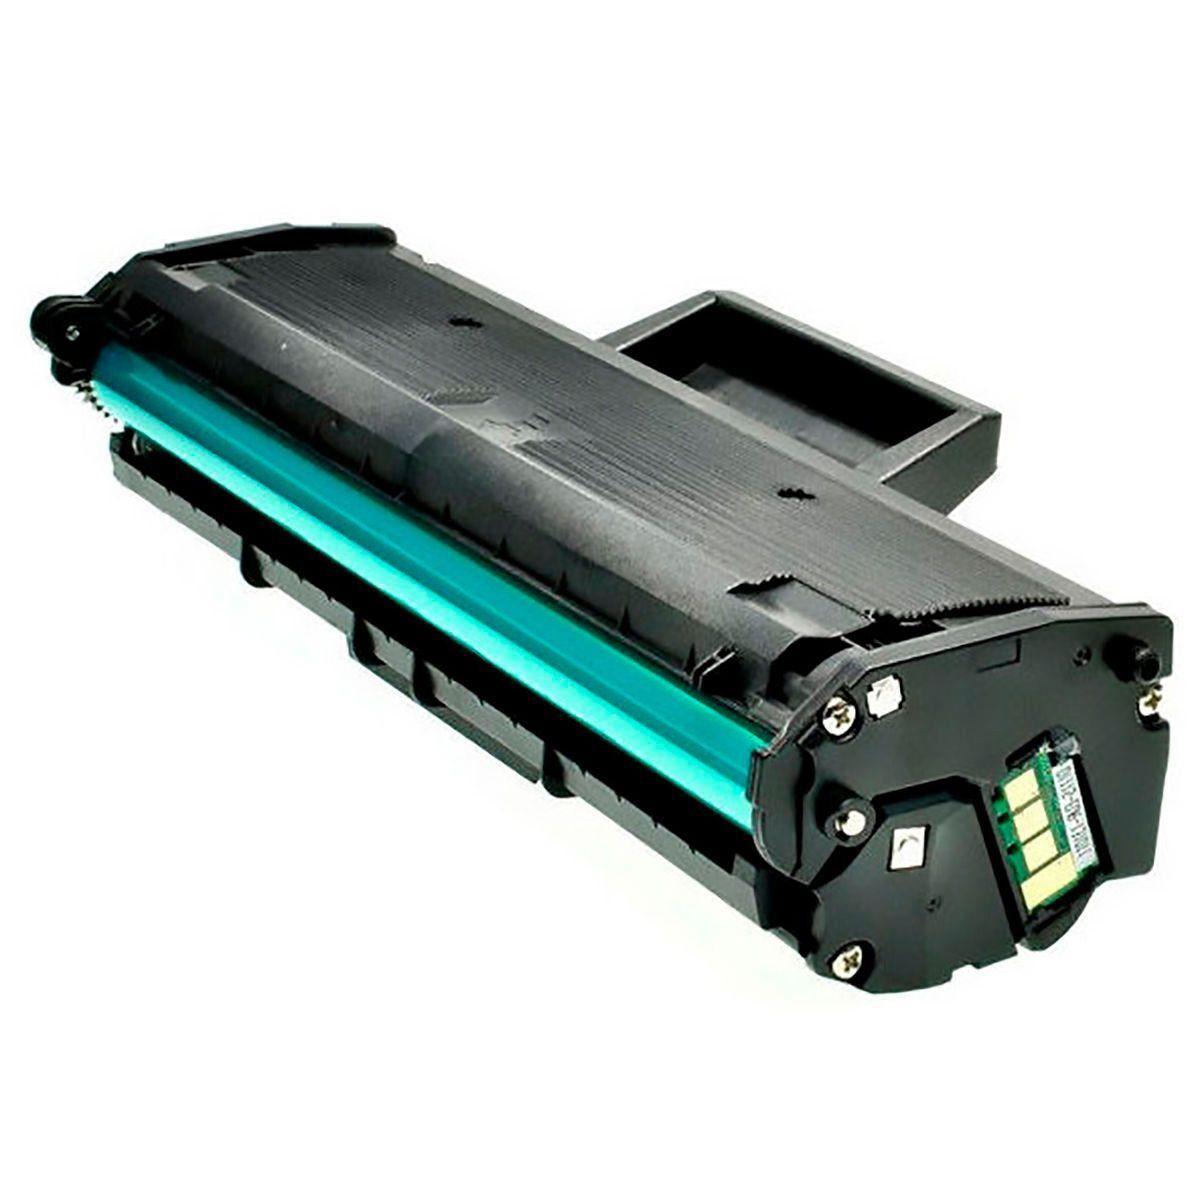 Compativel Toner D111 Mlt D111s Para Samsung M2020 M2020w M2020fw M2022 M2022w M2070 M2070w M2070fw Preto 1 000